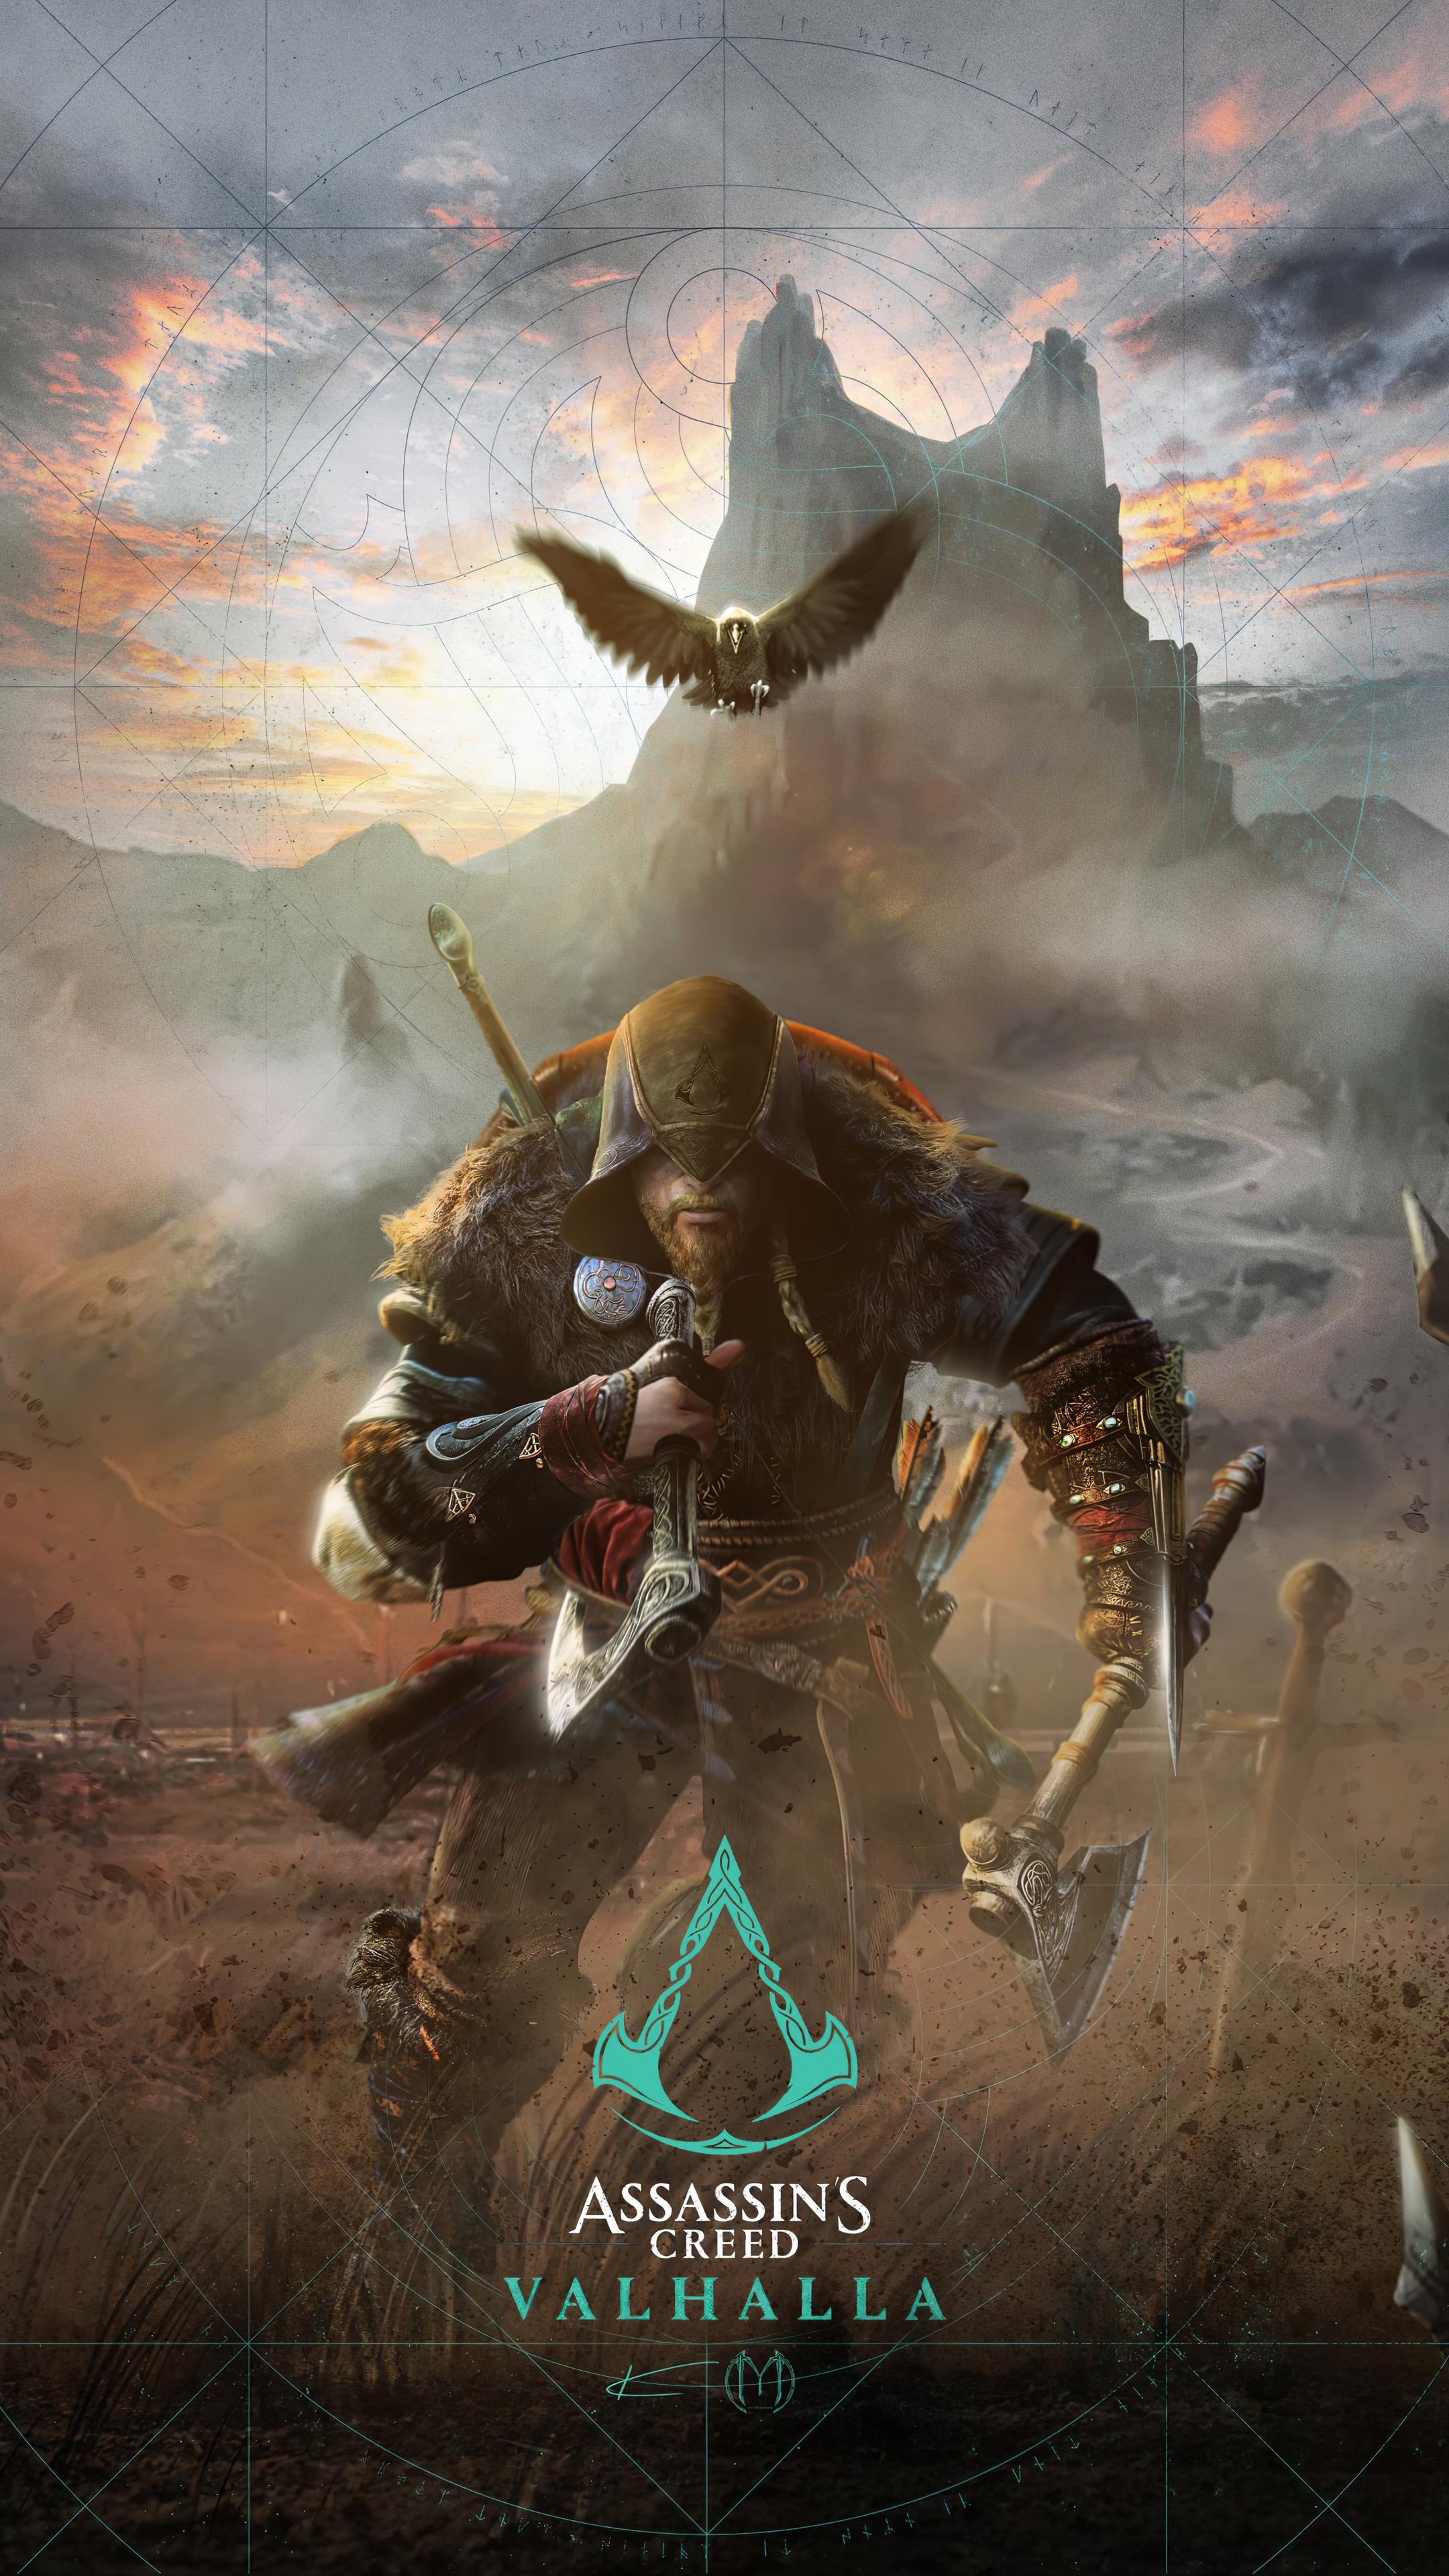 Assassins Creed Hd Filme